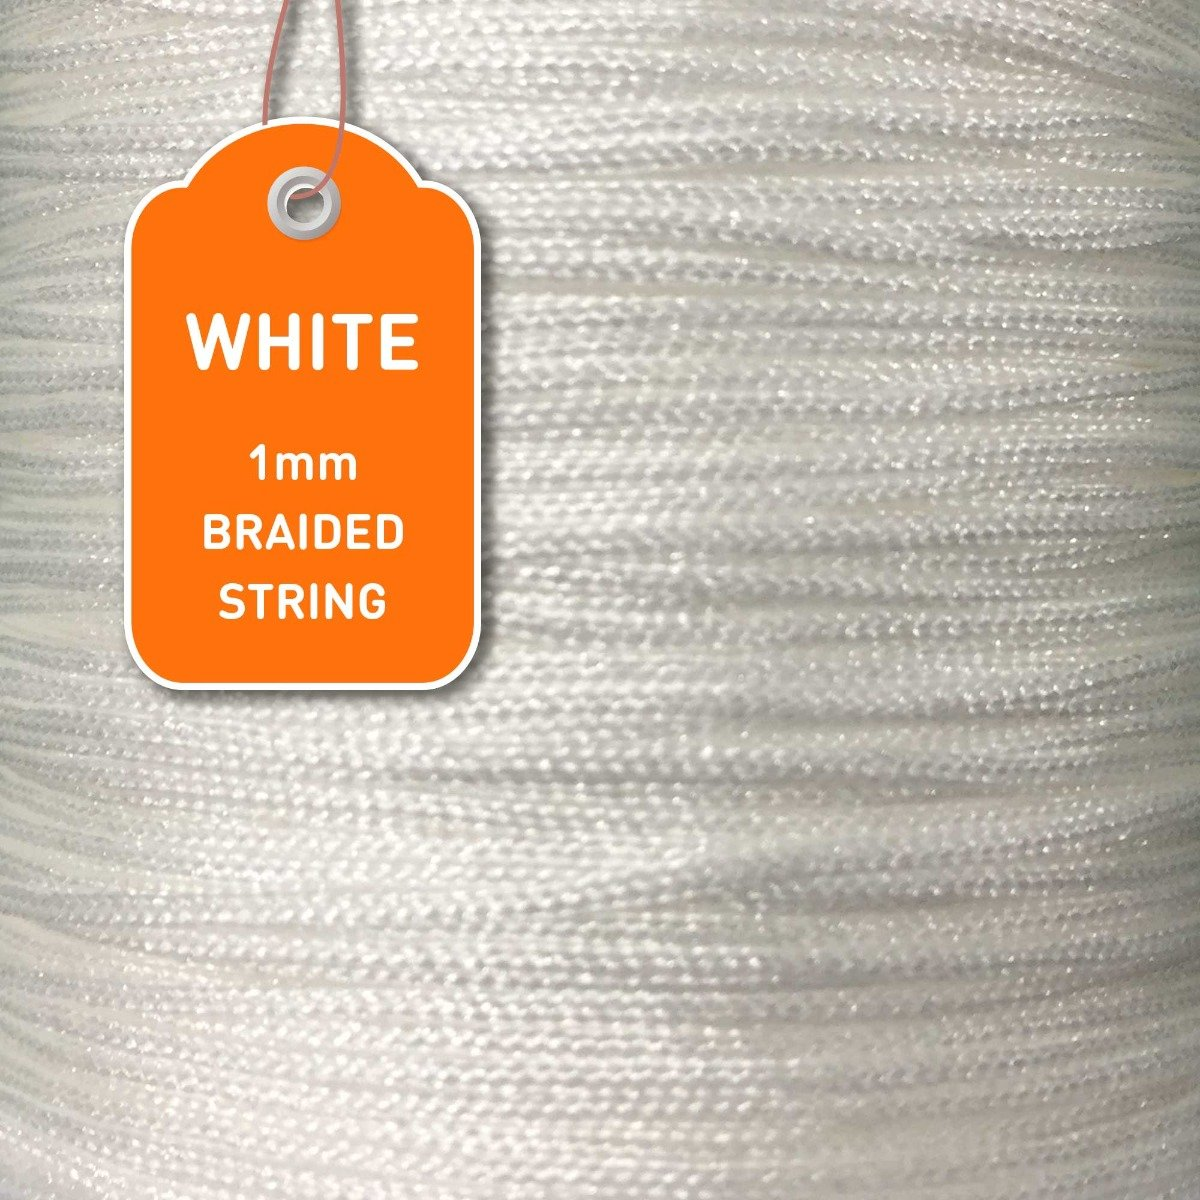 white-string